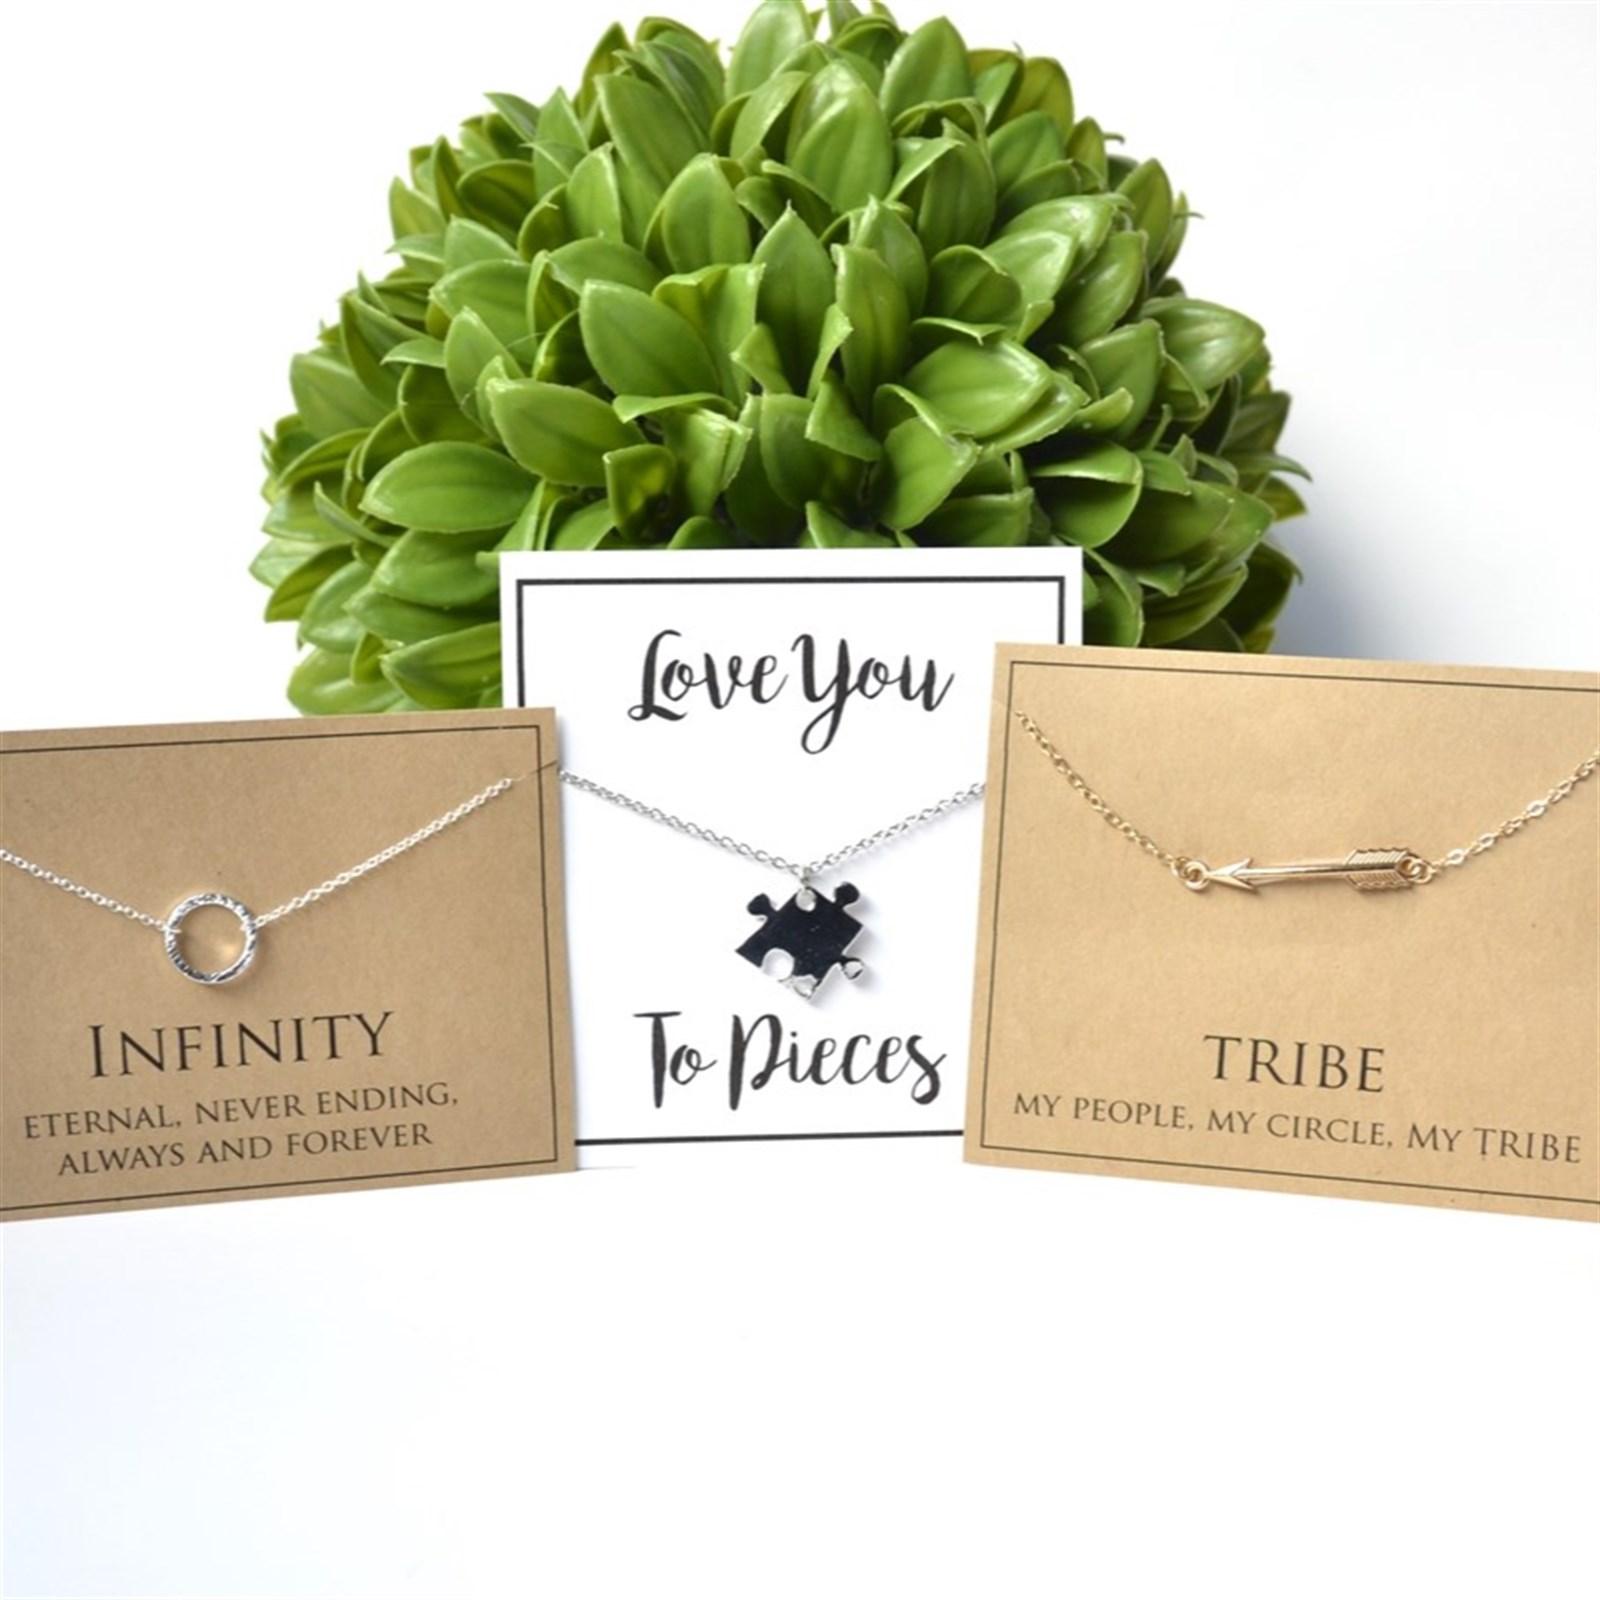 Inspirational Necklace & Card